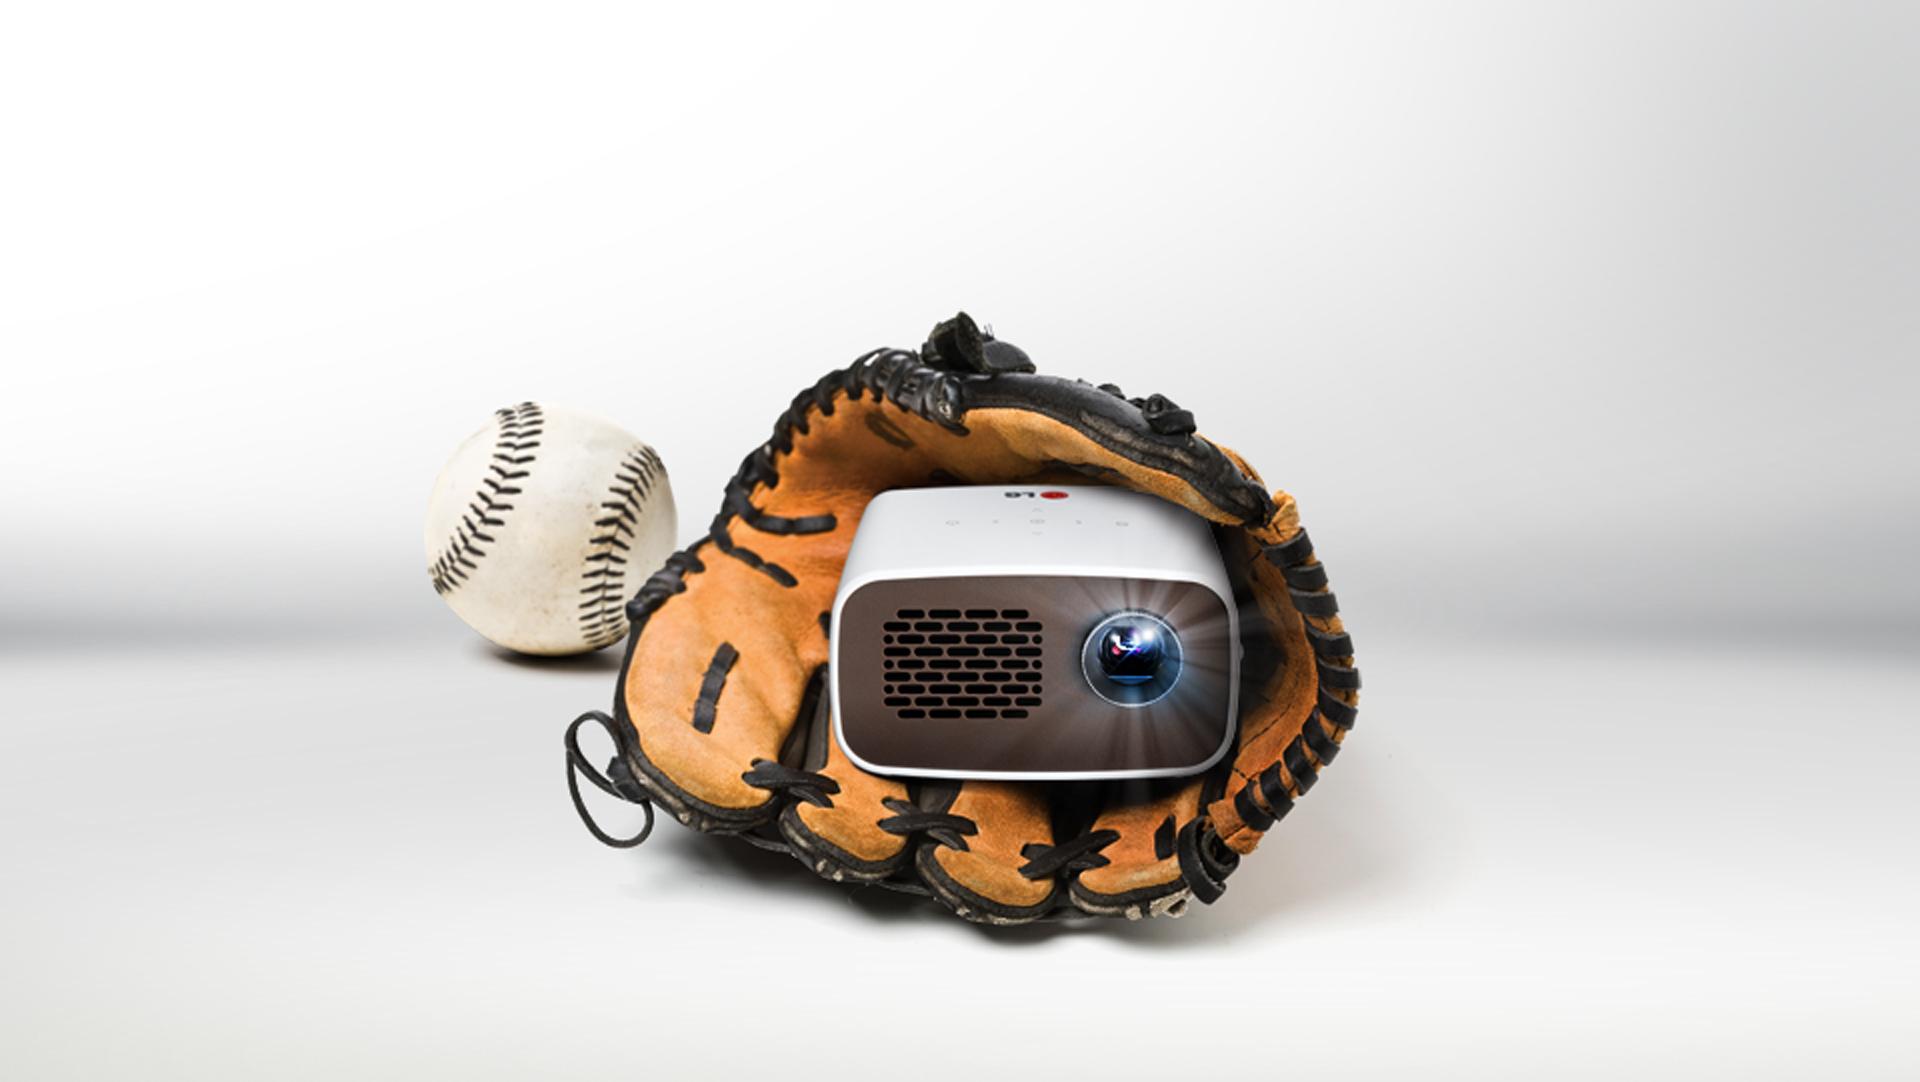 Front view of LG HD MiniBeam model PH300 held inside a baseball glove